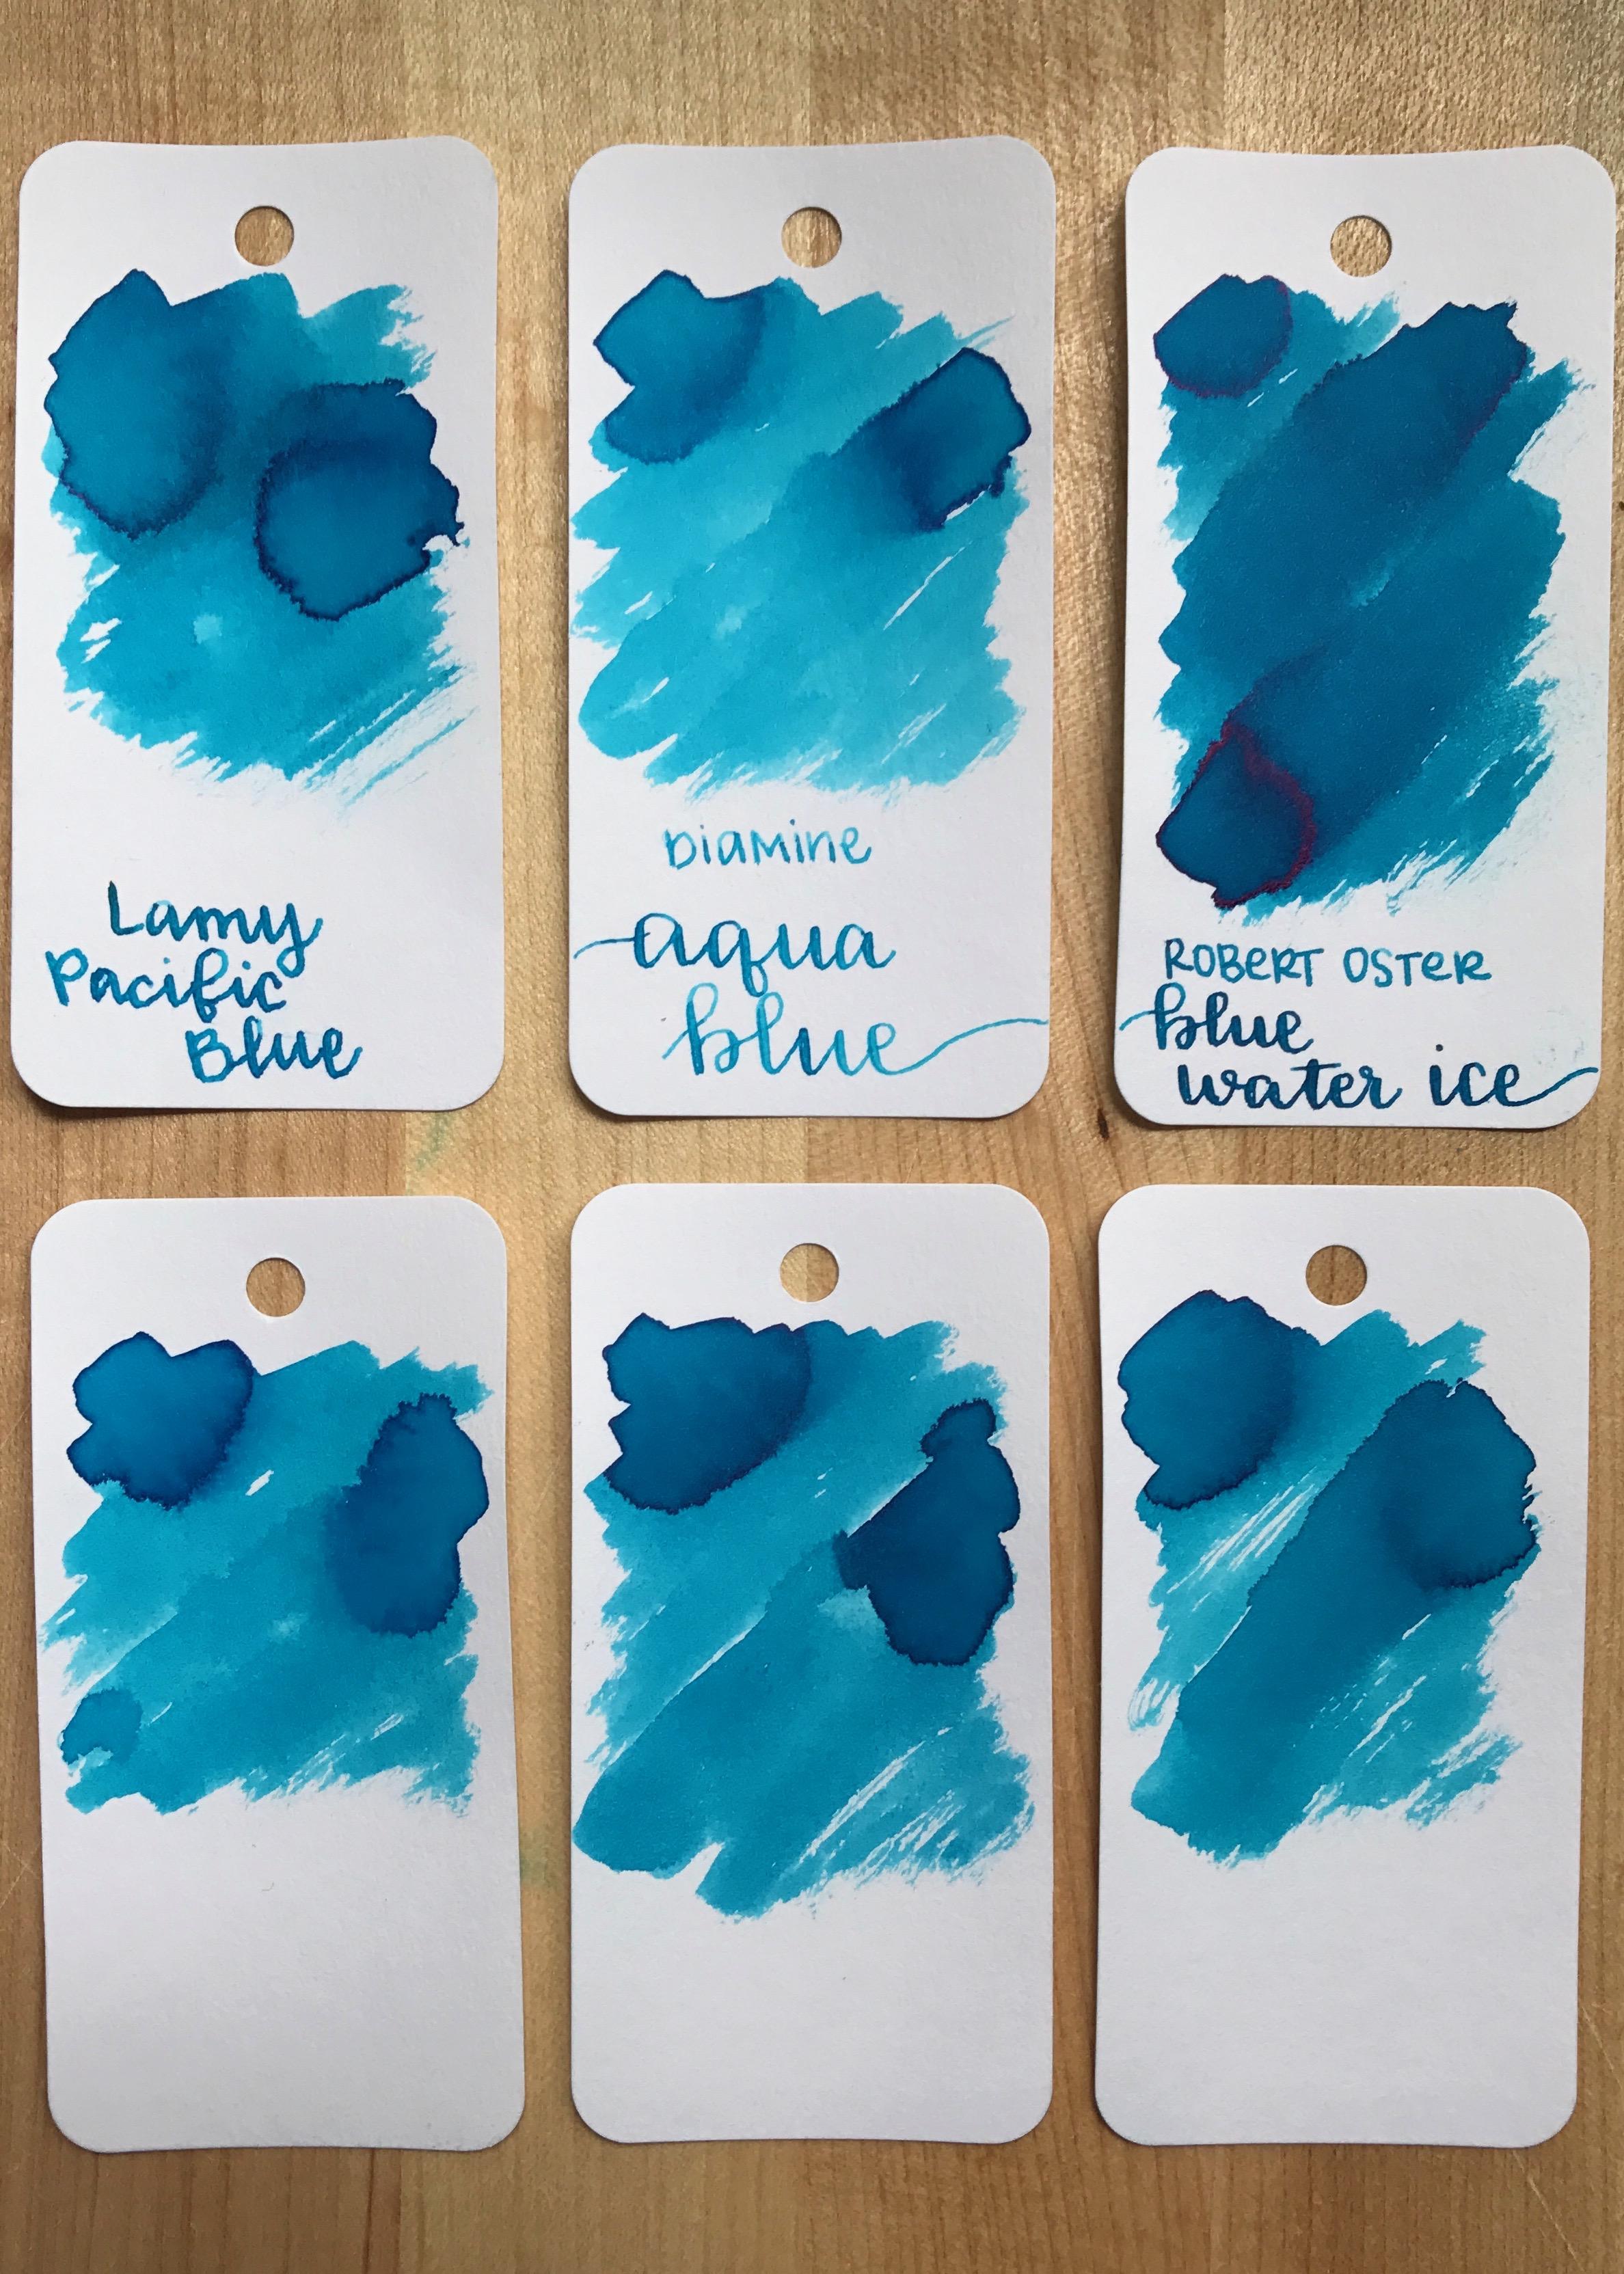 Similar inks: - Top row:left to right, Lamy Pacific Blue, Diamine Aqua Blue, and Robert Oster Blue Water Ice. Bottom row: Diamine Turquoise, Diamine Havasu Turquoise, and Robert Oster Australian Sky Blue.